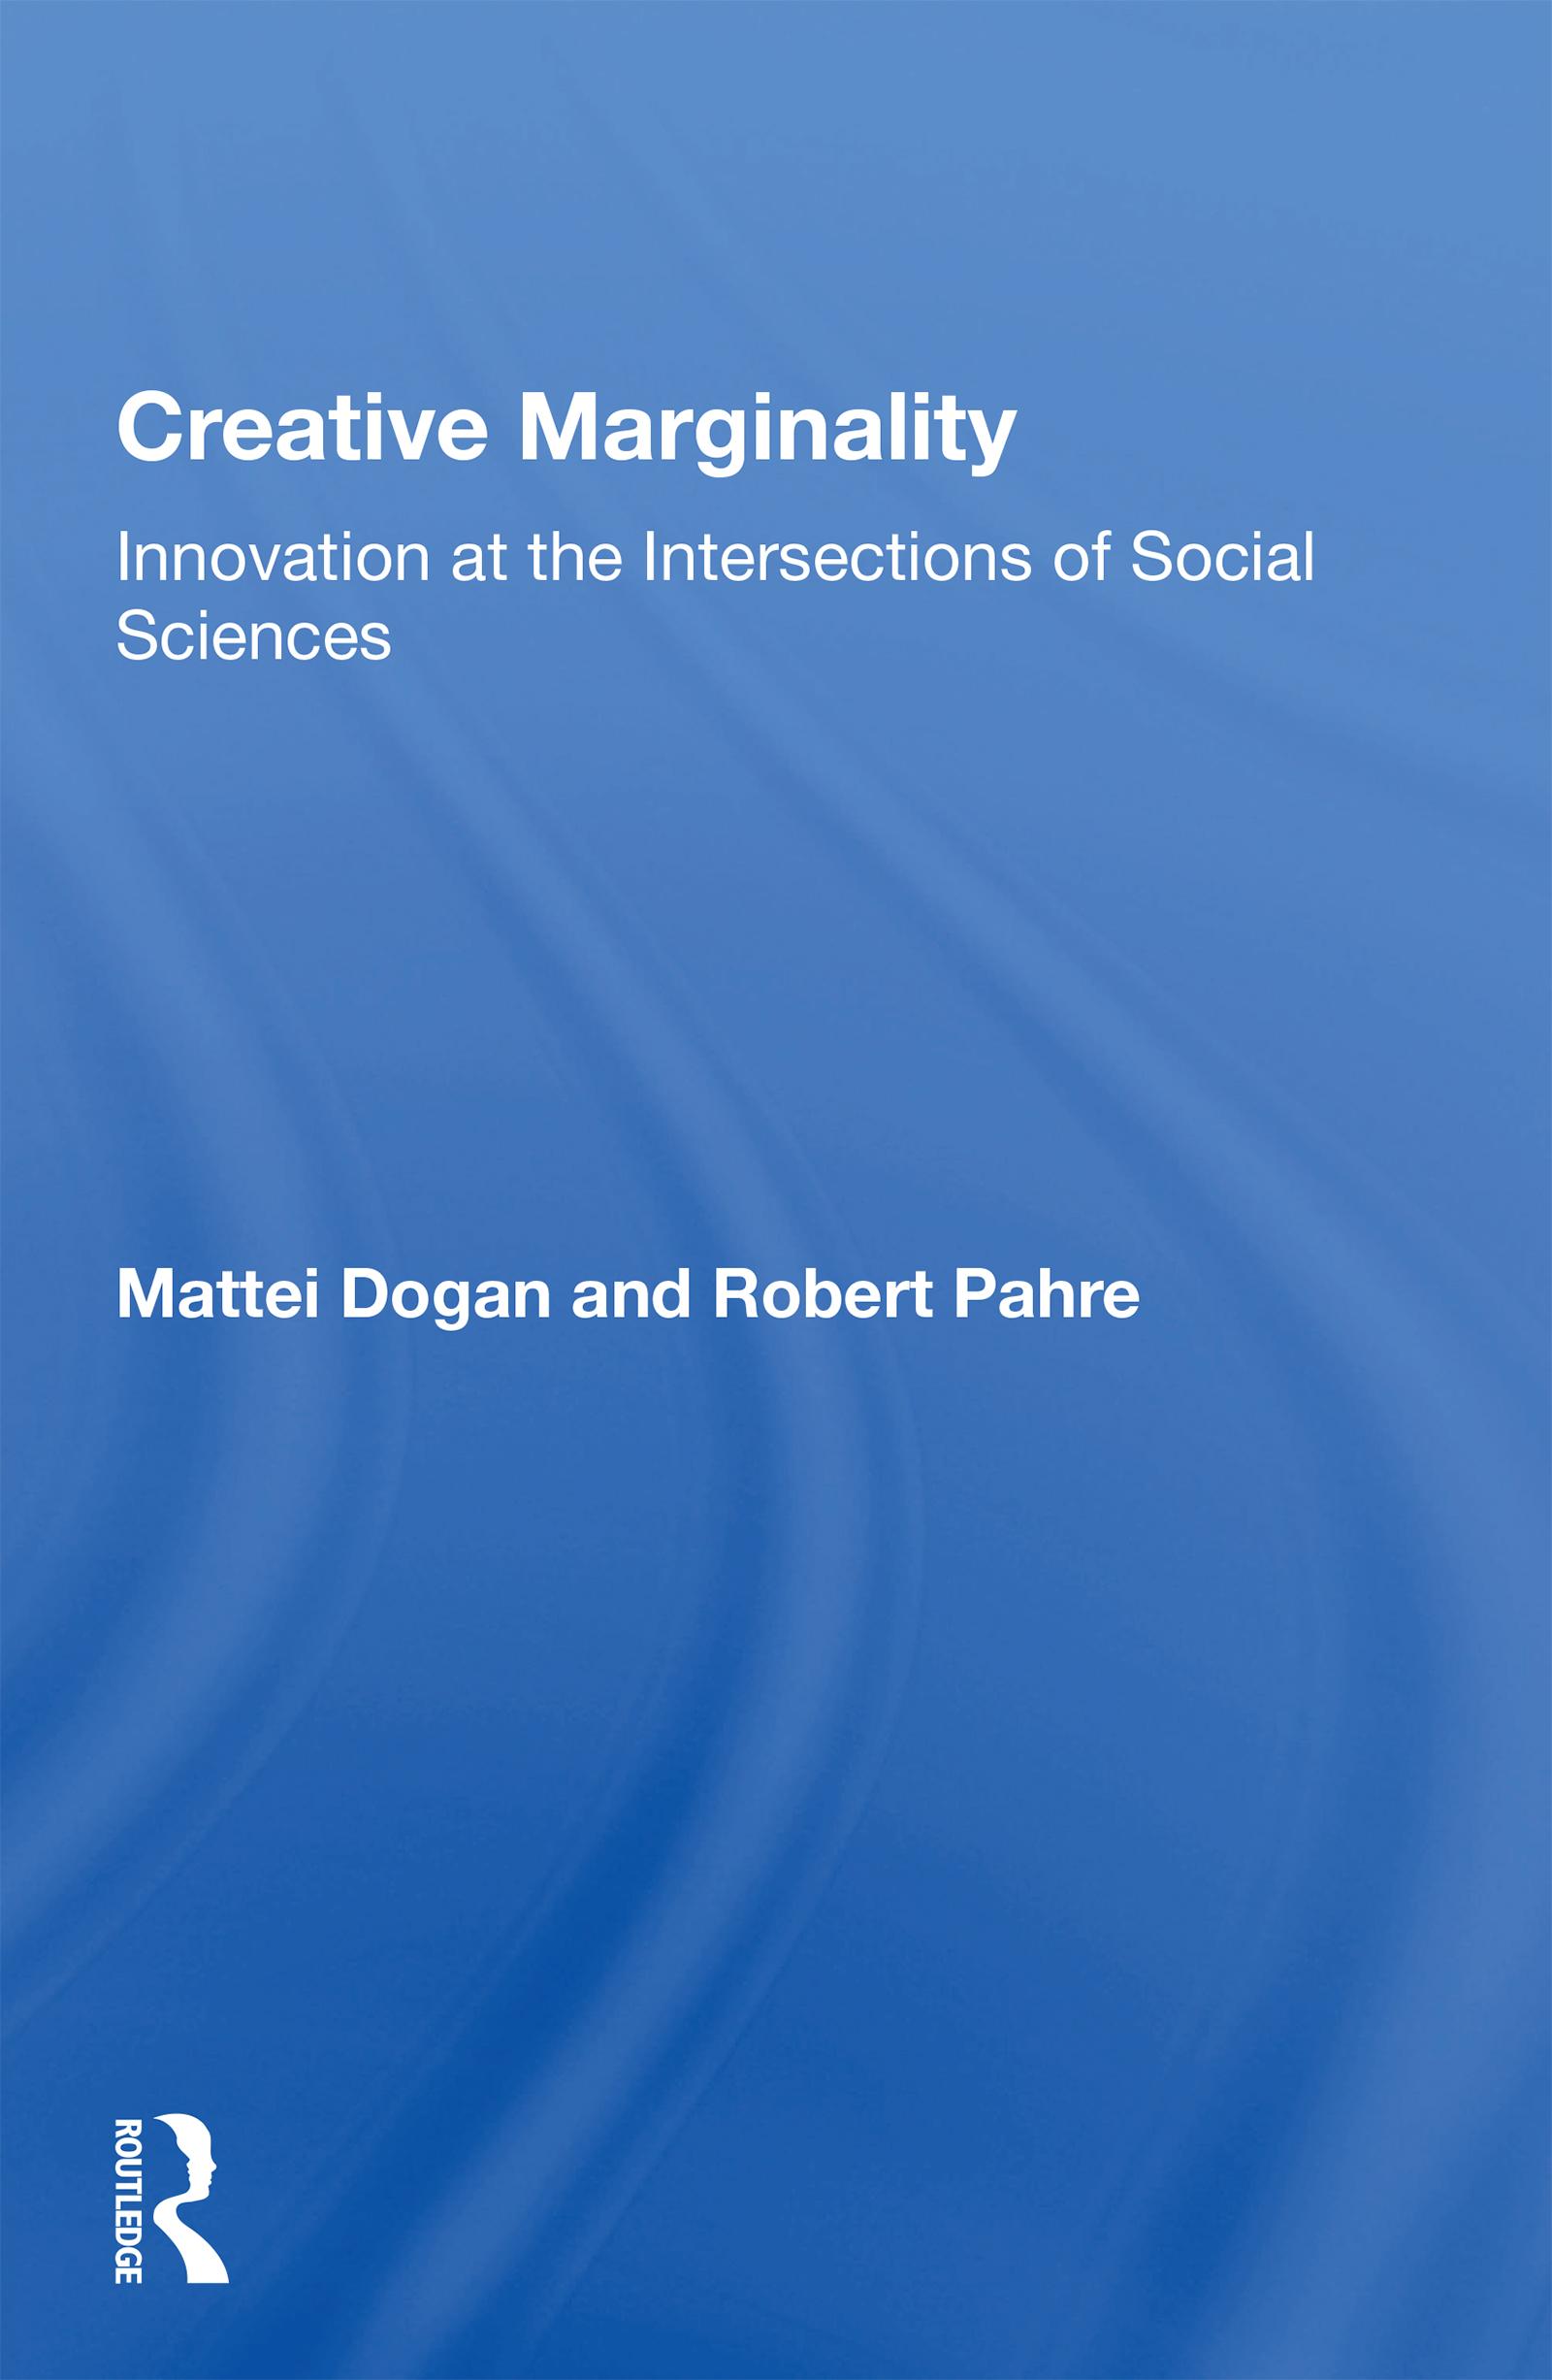 Creative Marginality